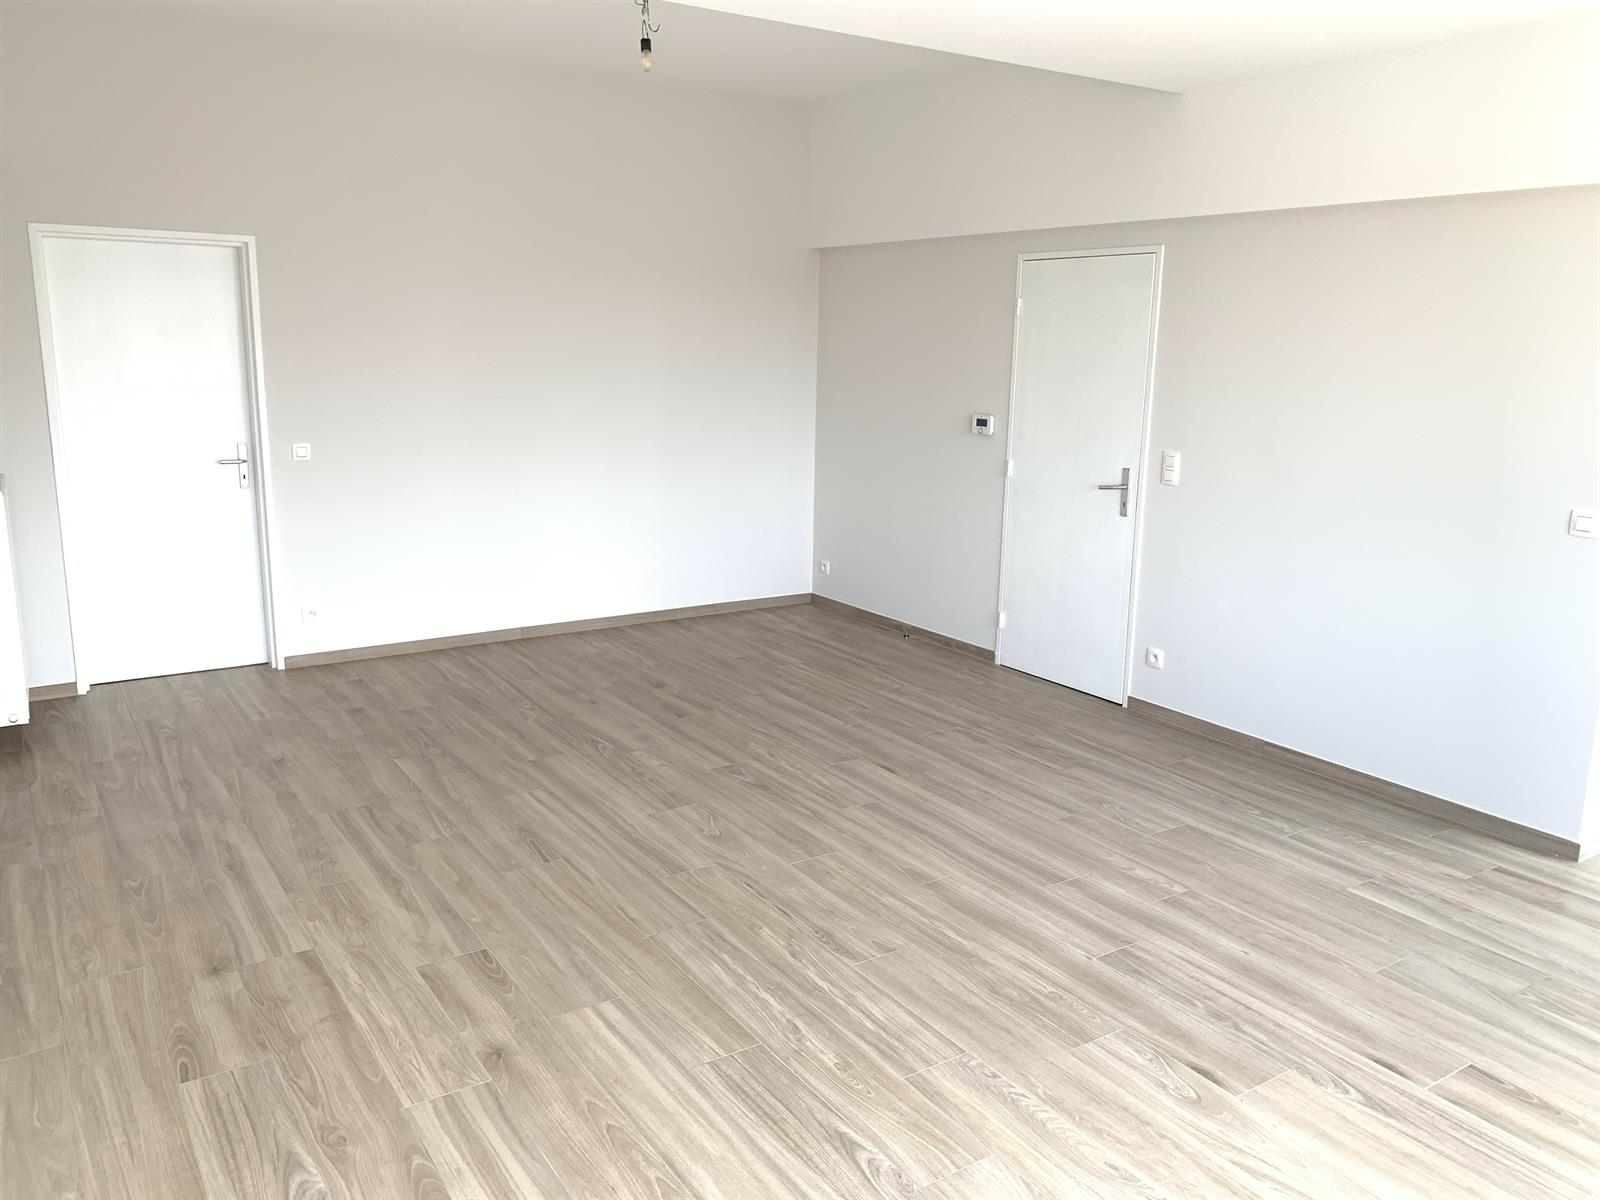 Appartement - Auderghem - #4393981-1